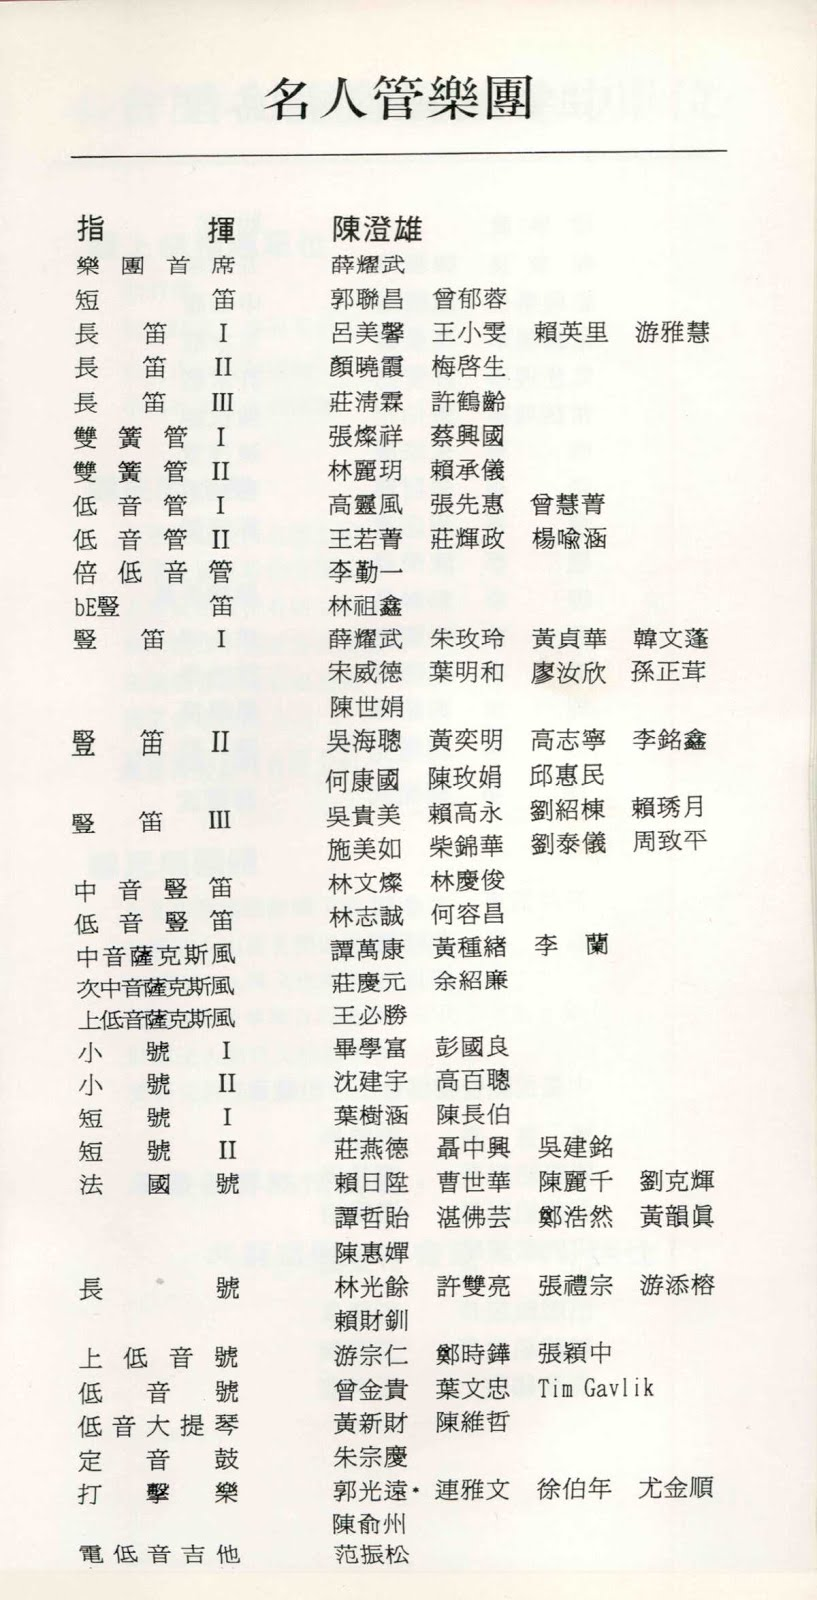 1990_Star_Band2.jpg